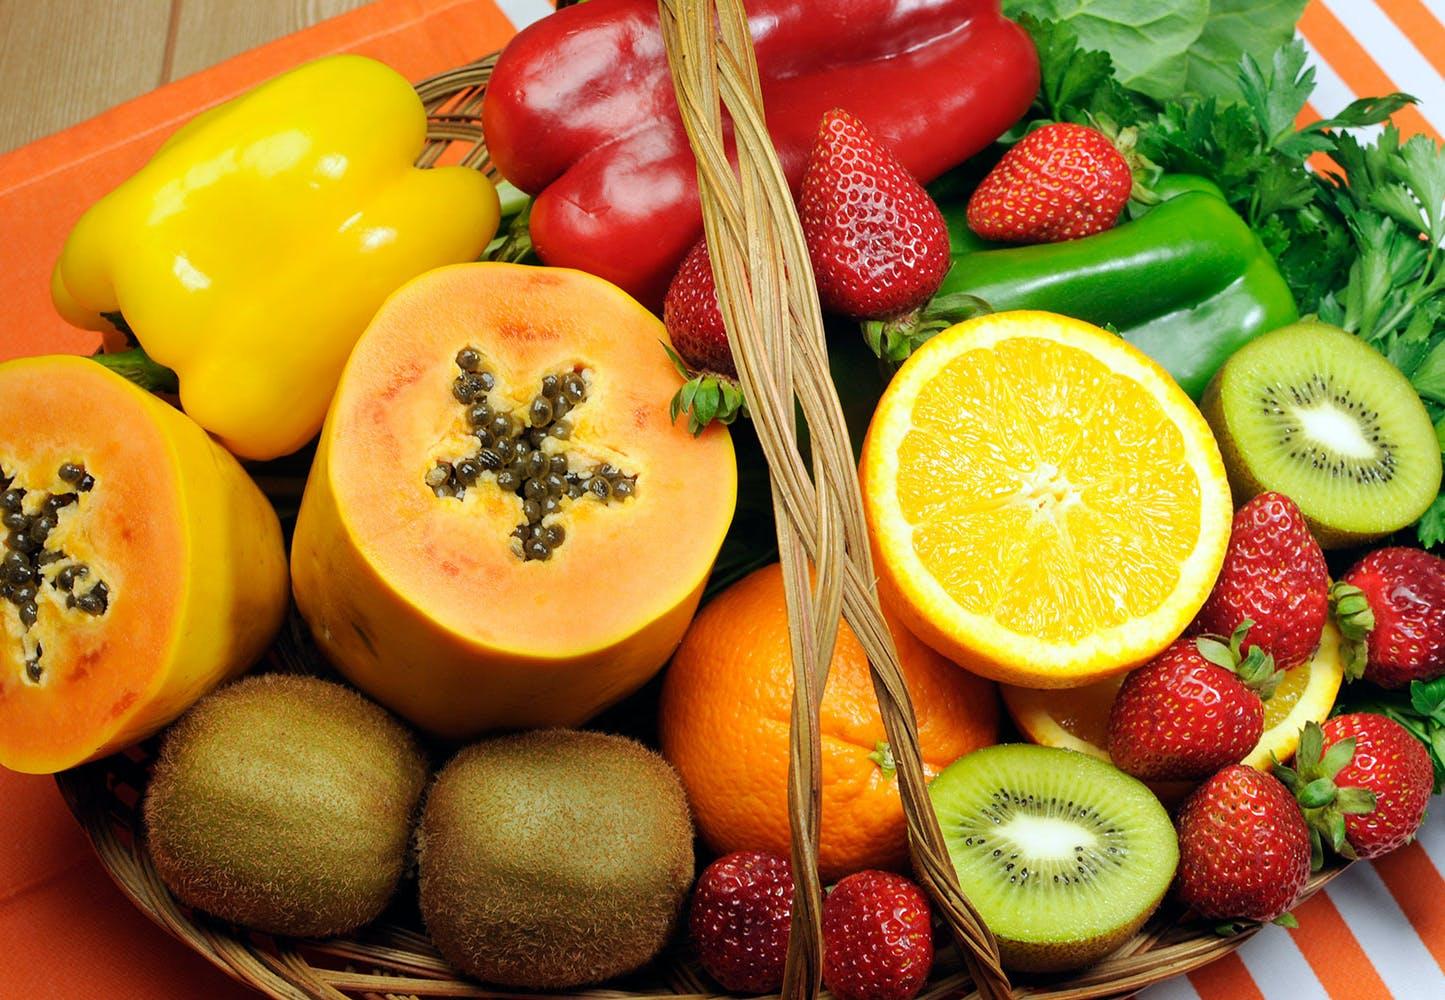 9 voedingsmiddelen met m r vitamine c dan een sinaasappel. Black Bedroom Furniture Sets. Home Design Ideas